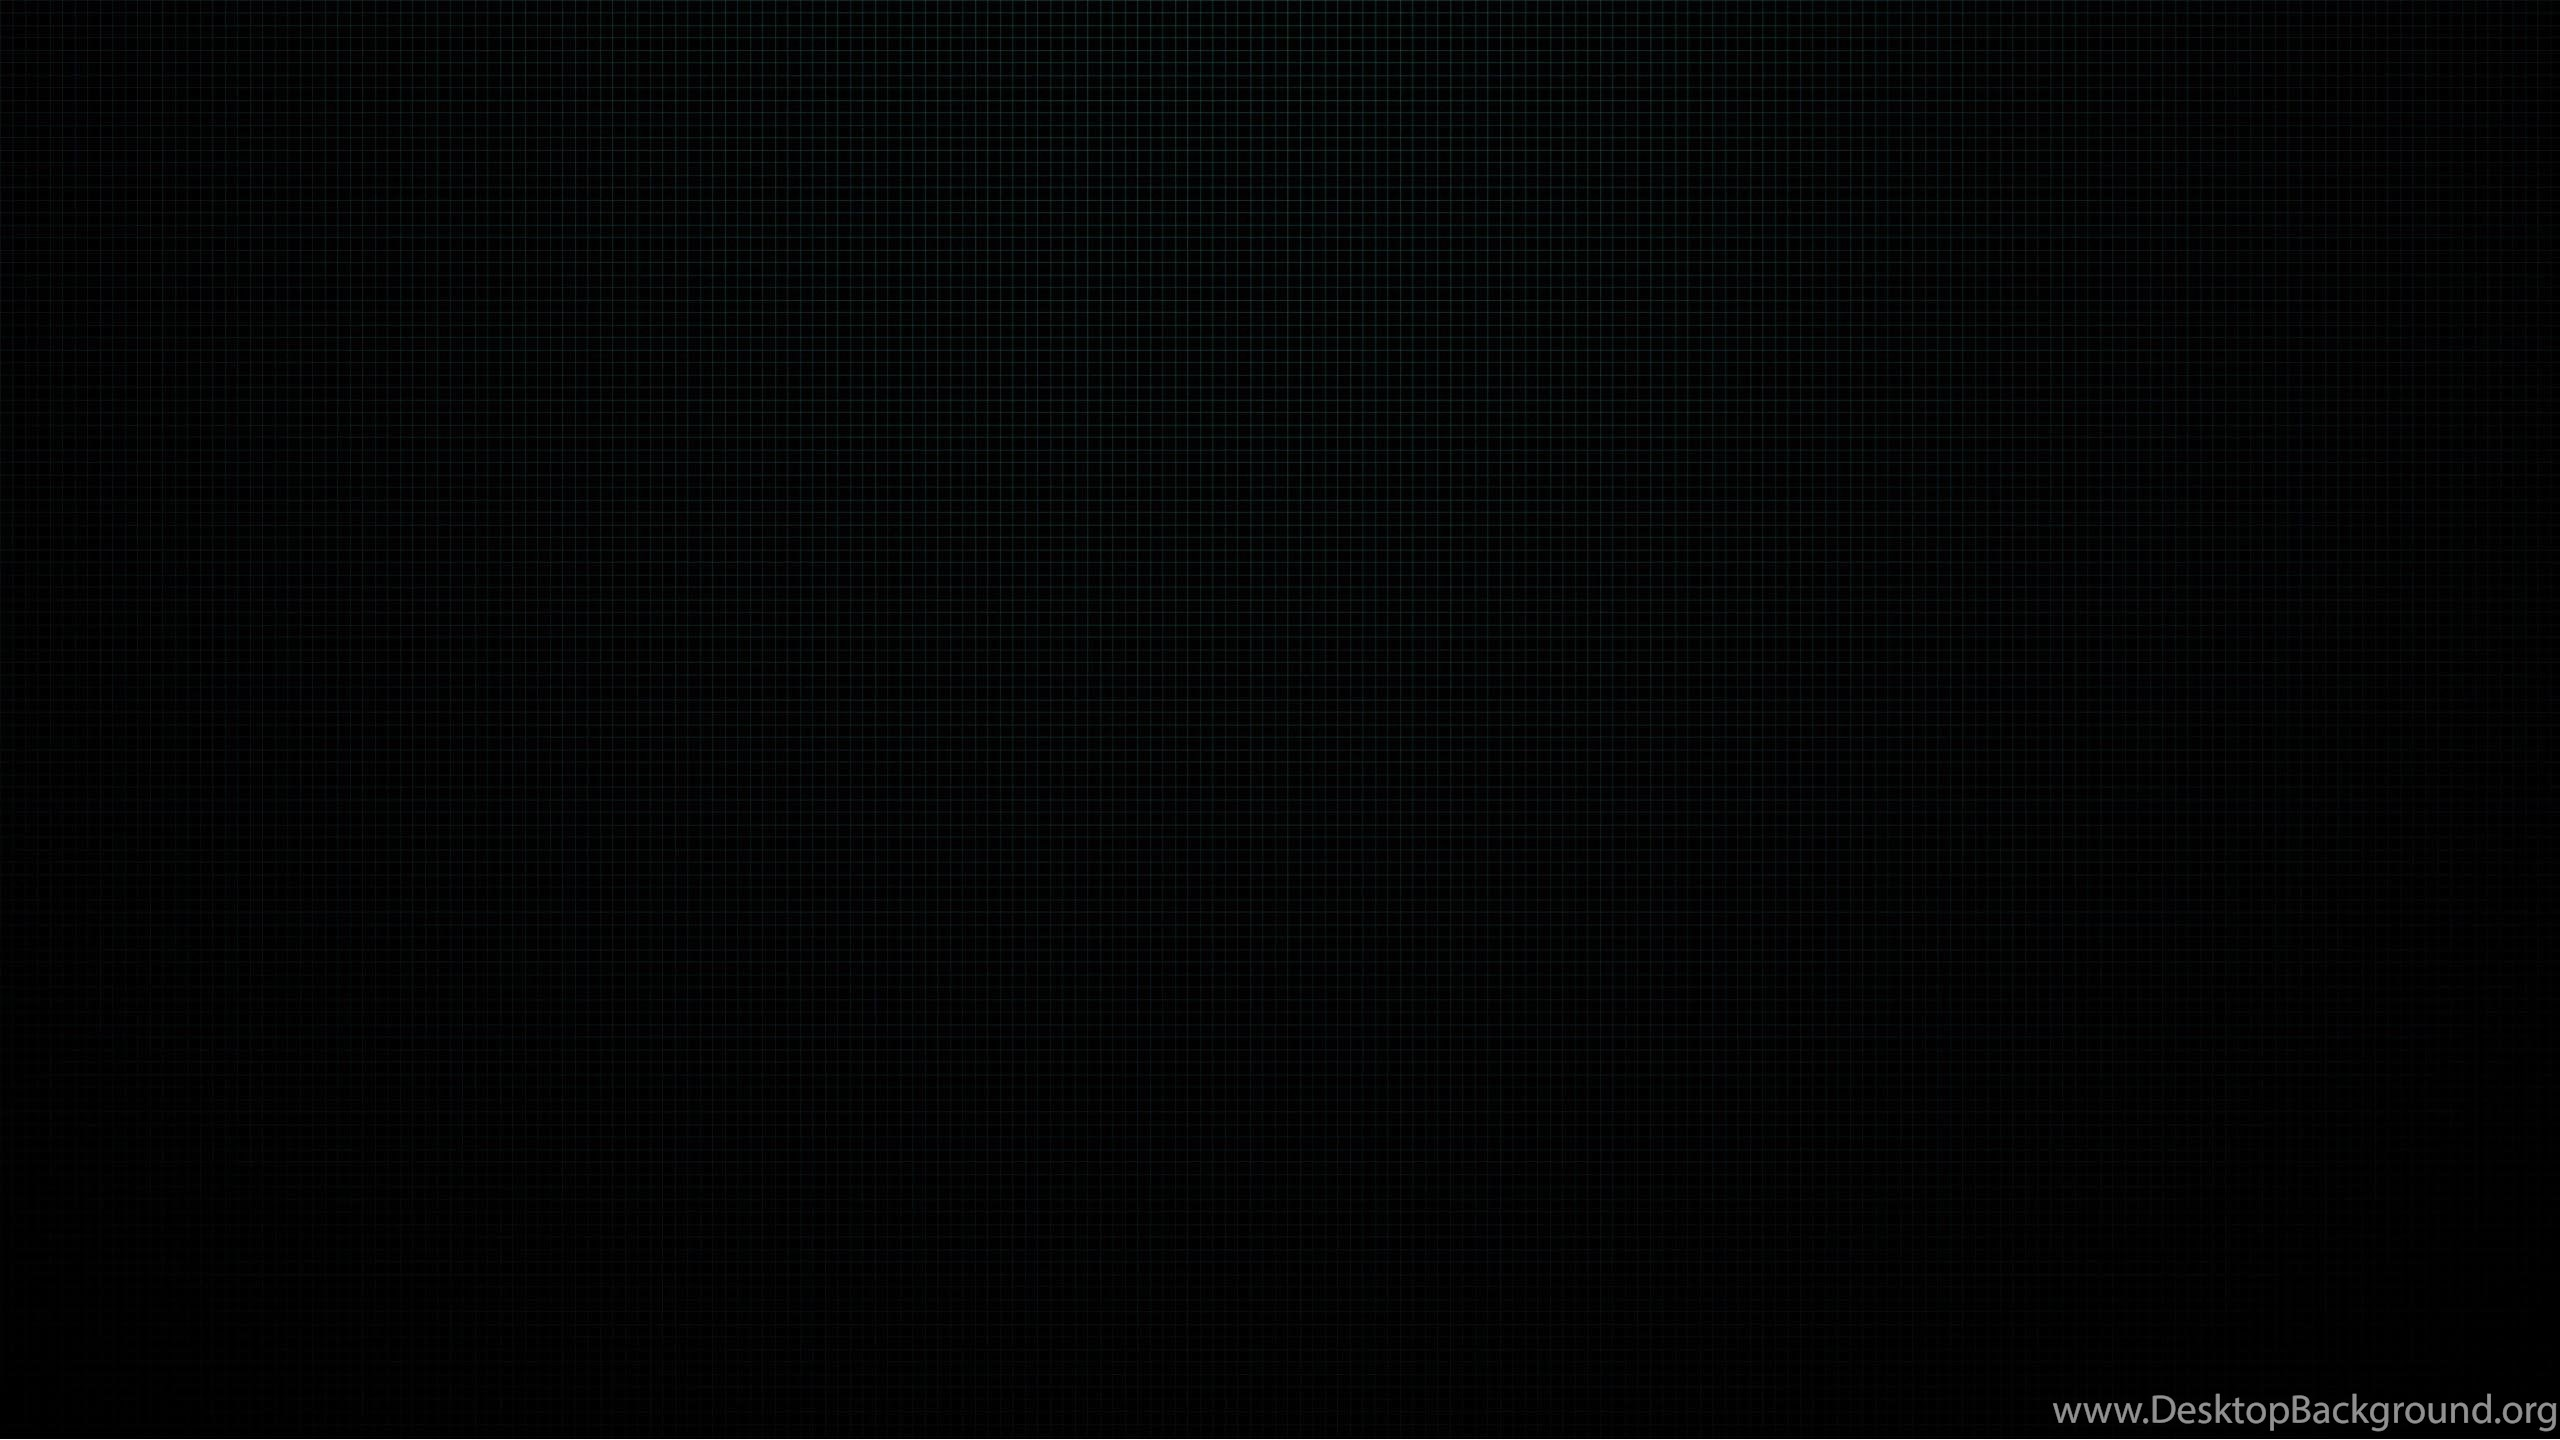 Pure Black Wallpapers Desktop Background